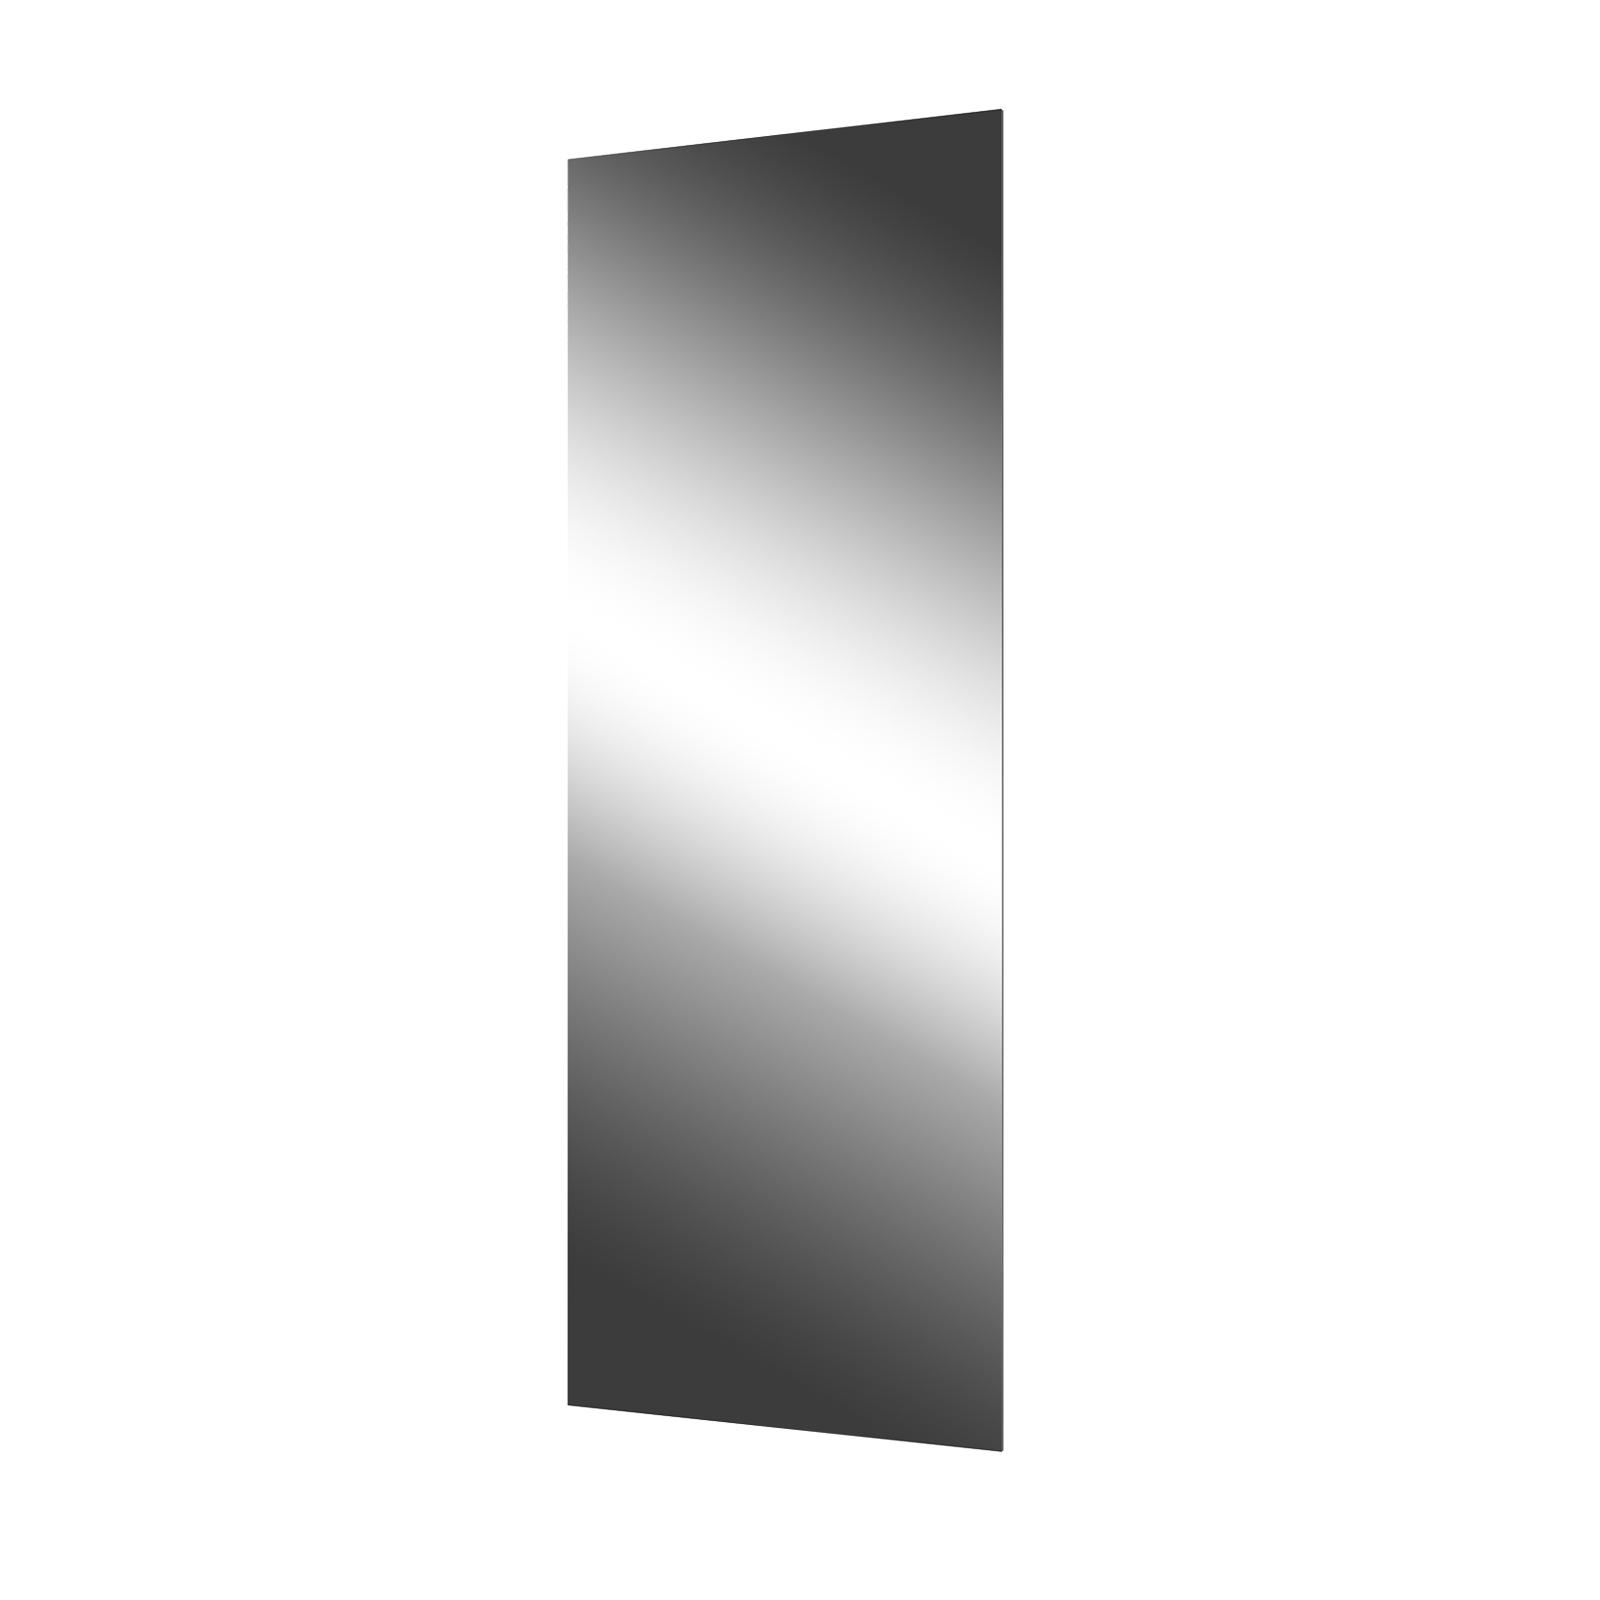 Living Elements 1200 x 450 x 5mm Flat Edge Mirror